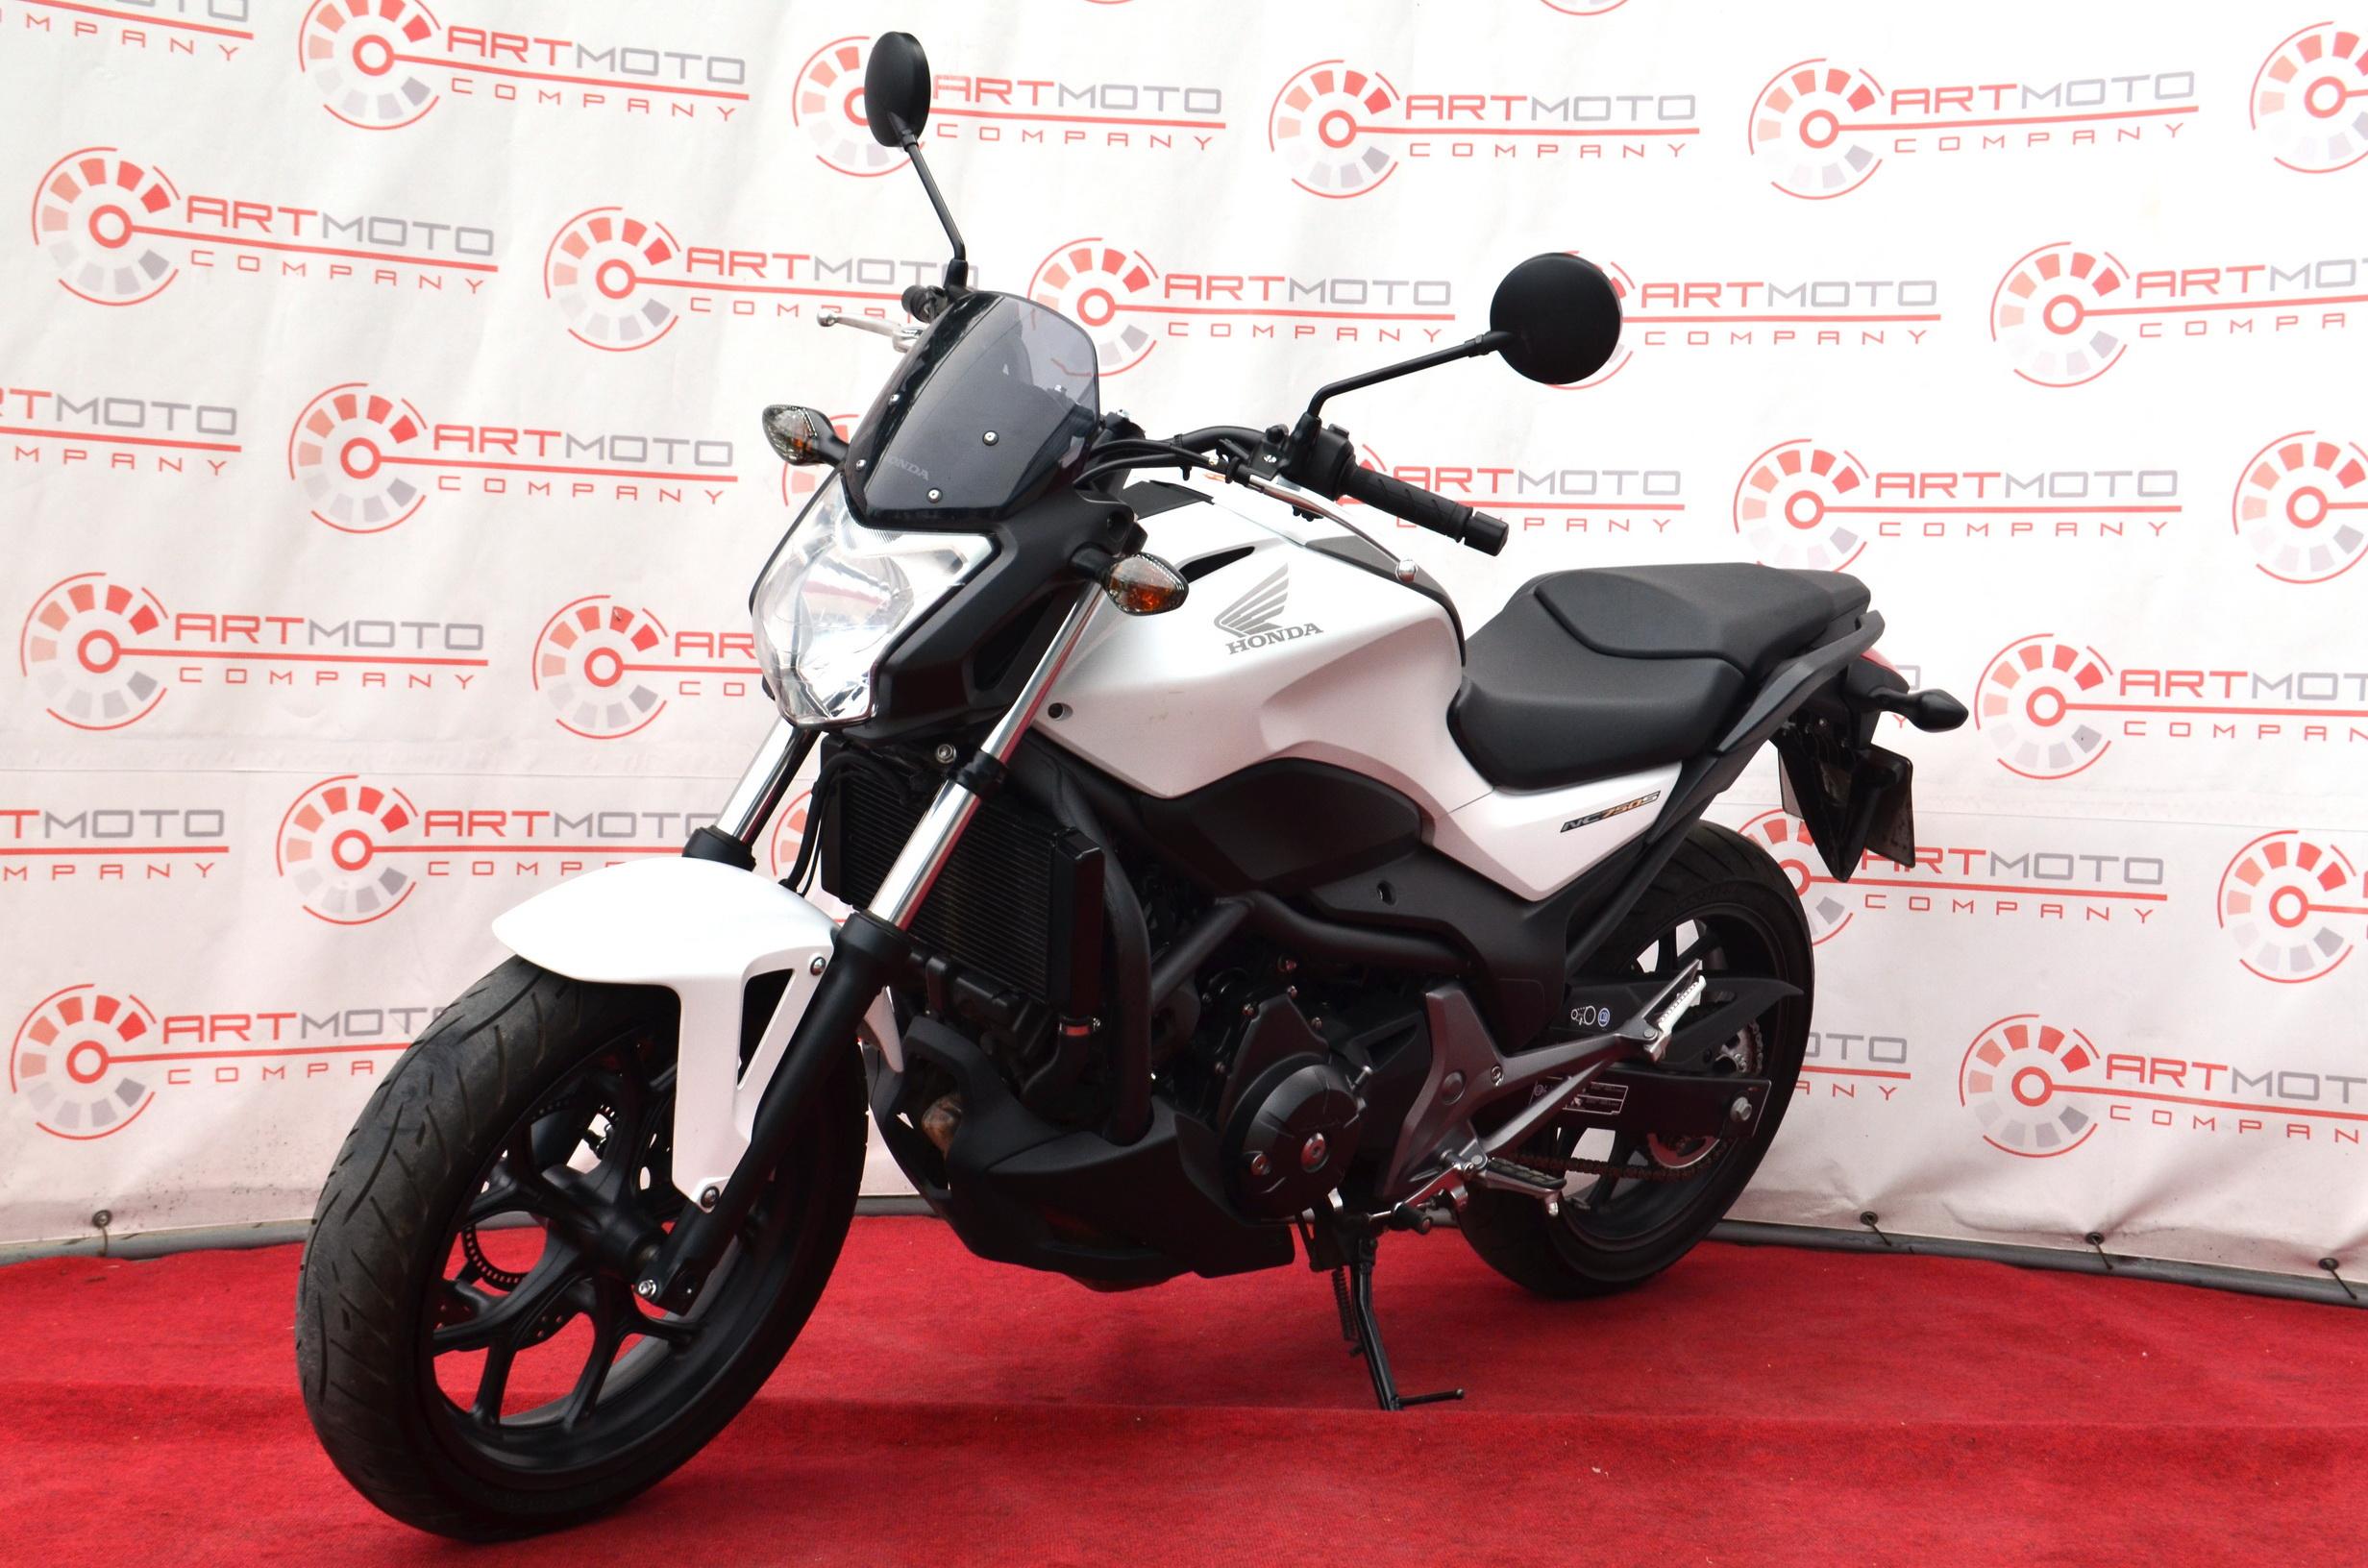 МОТОЦИКЛ HONDA NC750S  Артмото - купить квадроцикл в украине и харькове, мотоцикл, снегоход, скутер, мопед, электромобиль